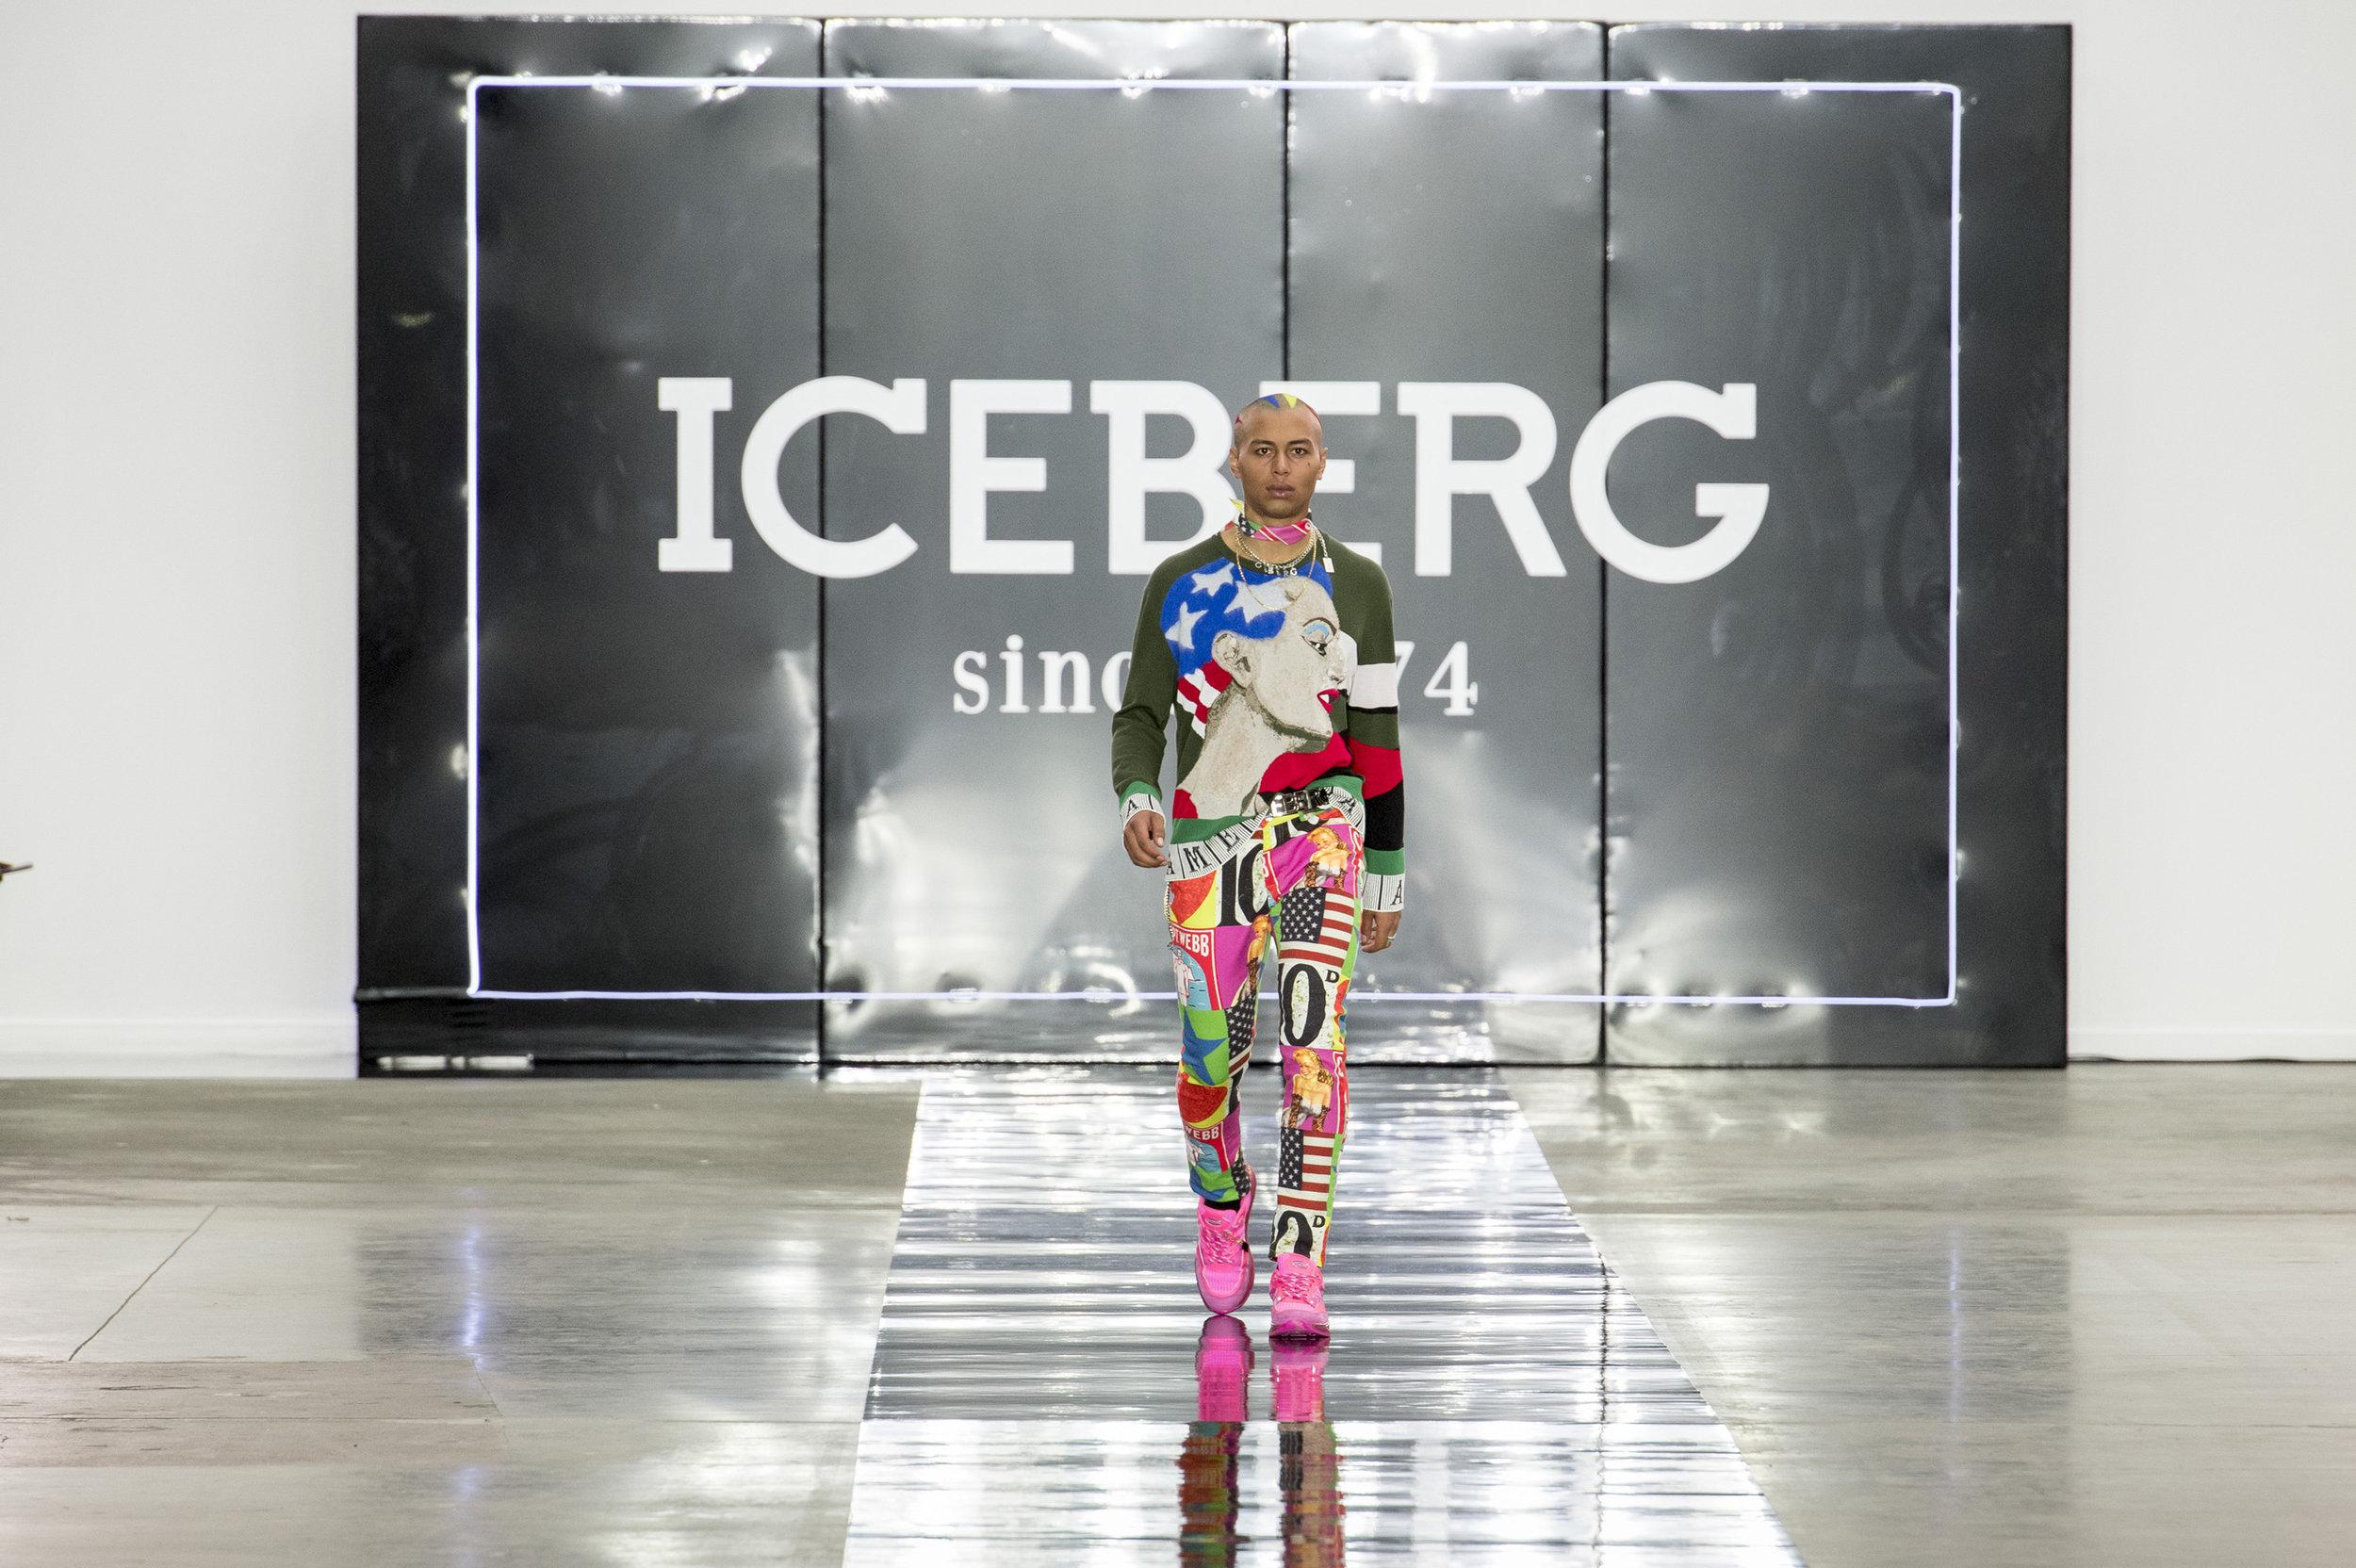 Iceberg m RS20 7594.jpg